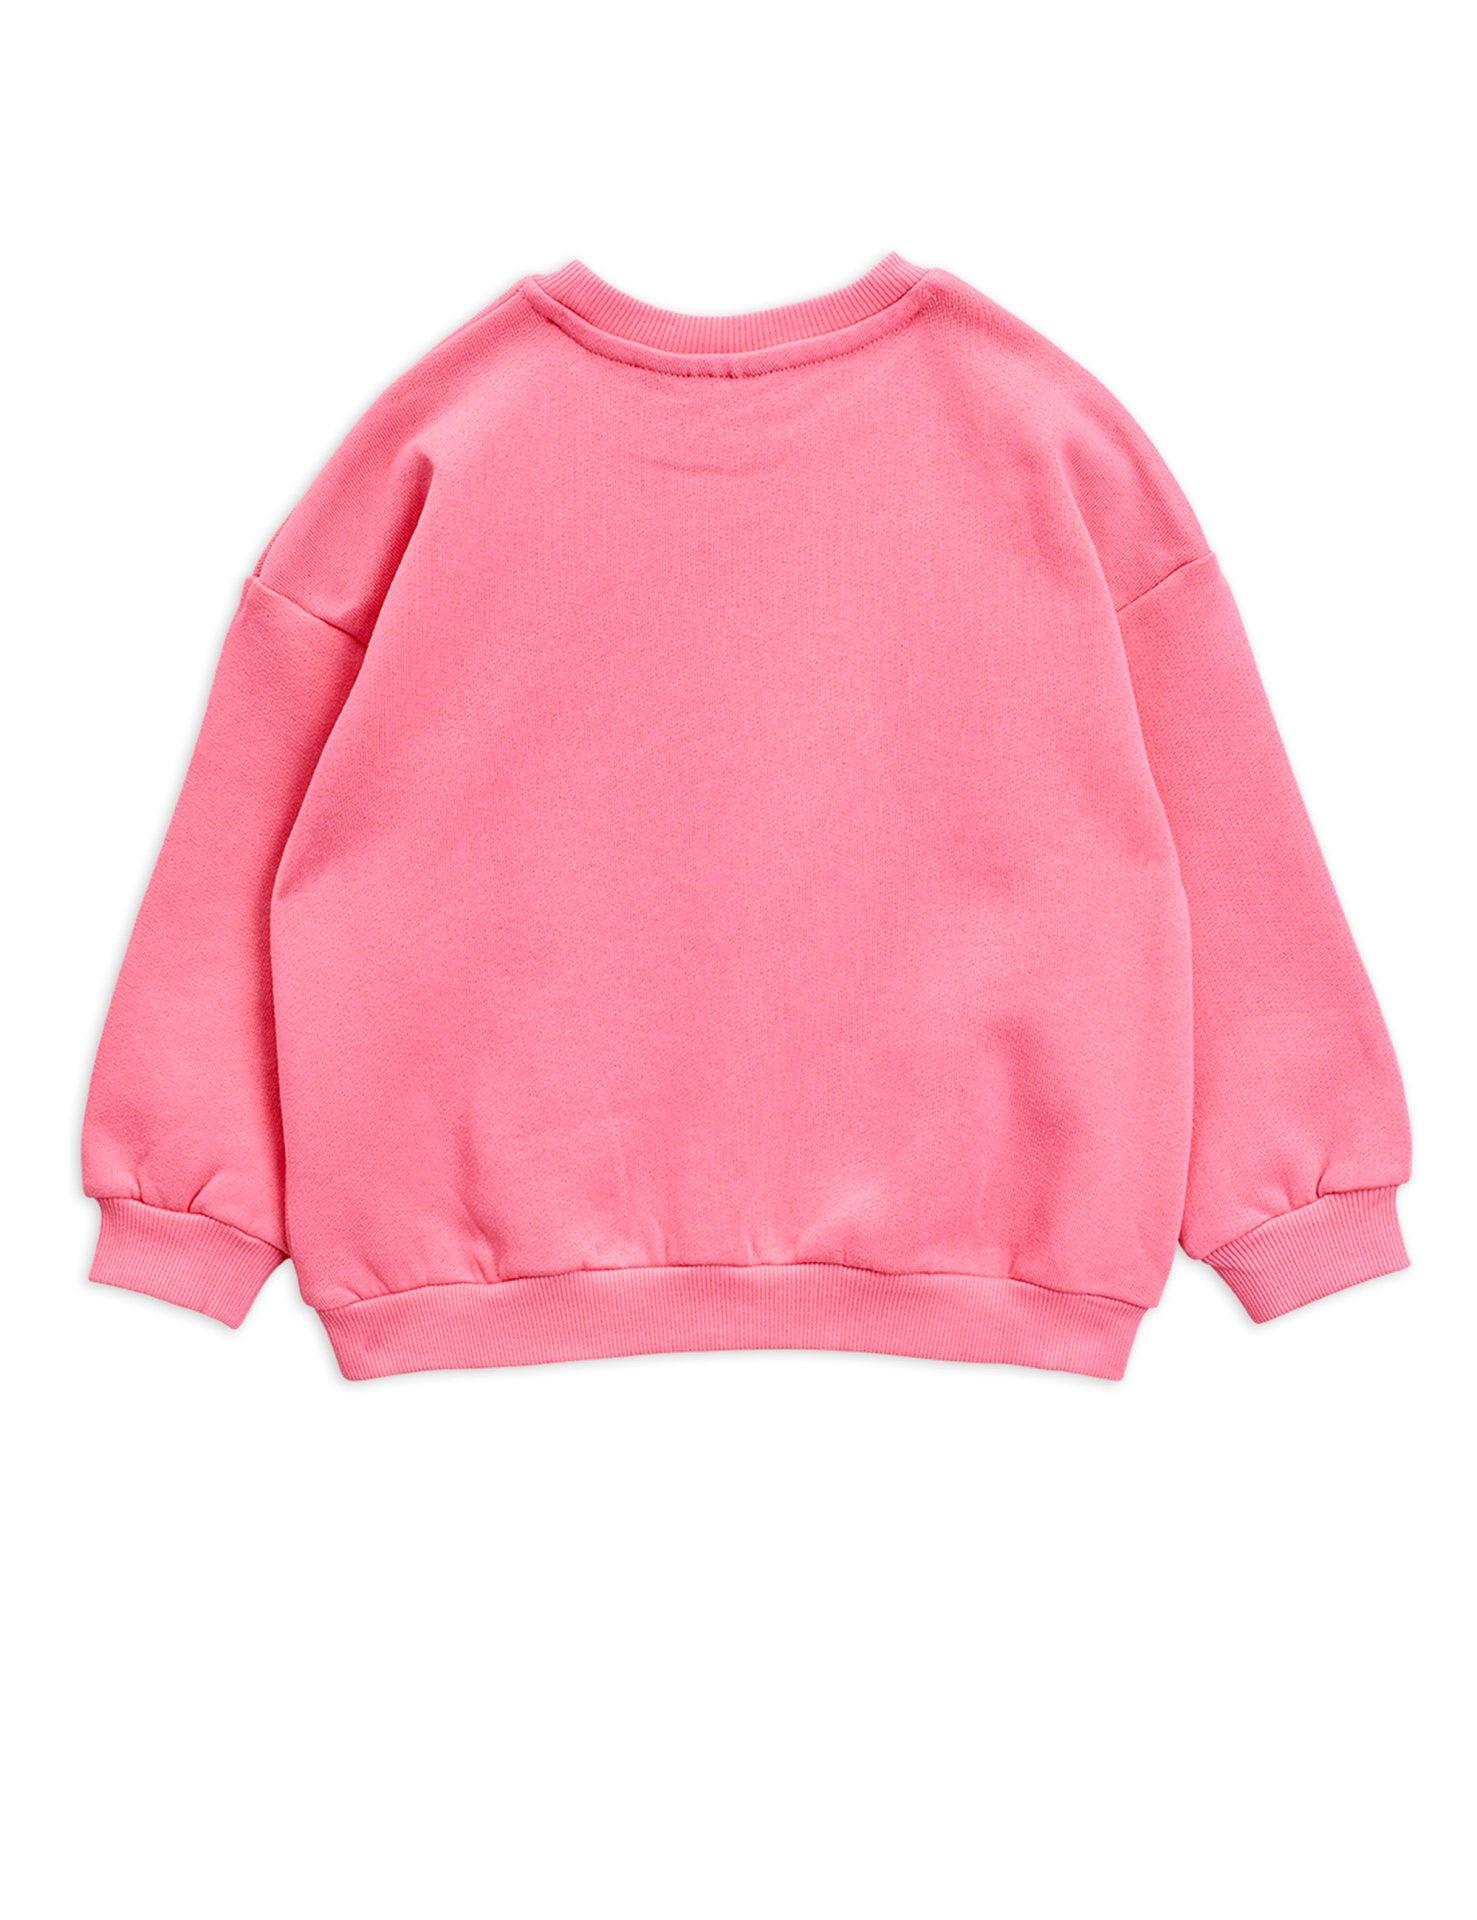 Viola emb sweatshirt - Pink-3